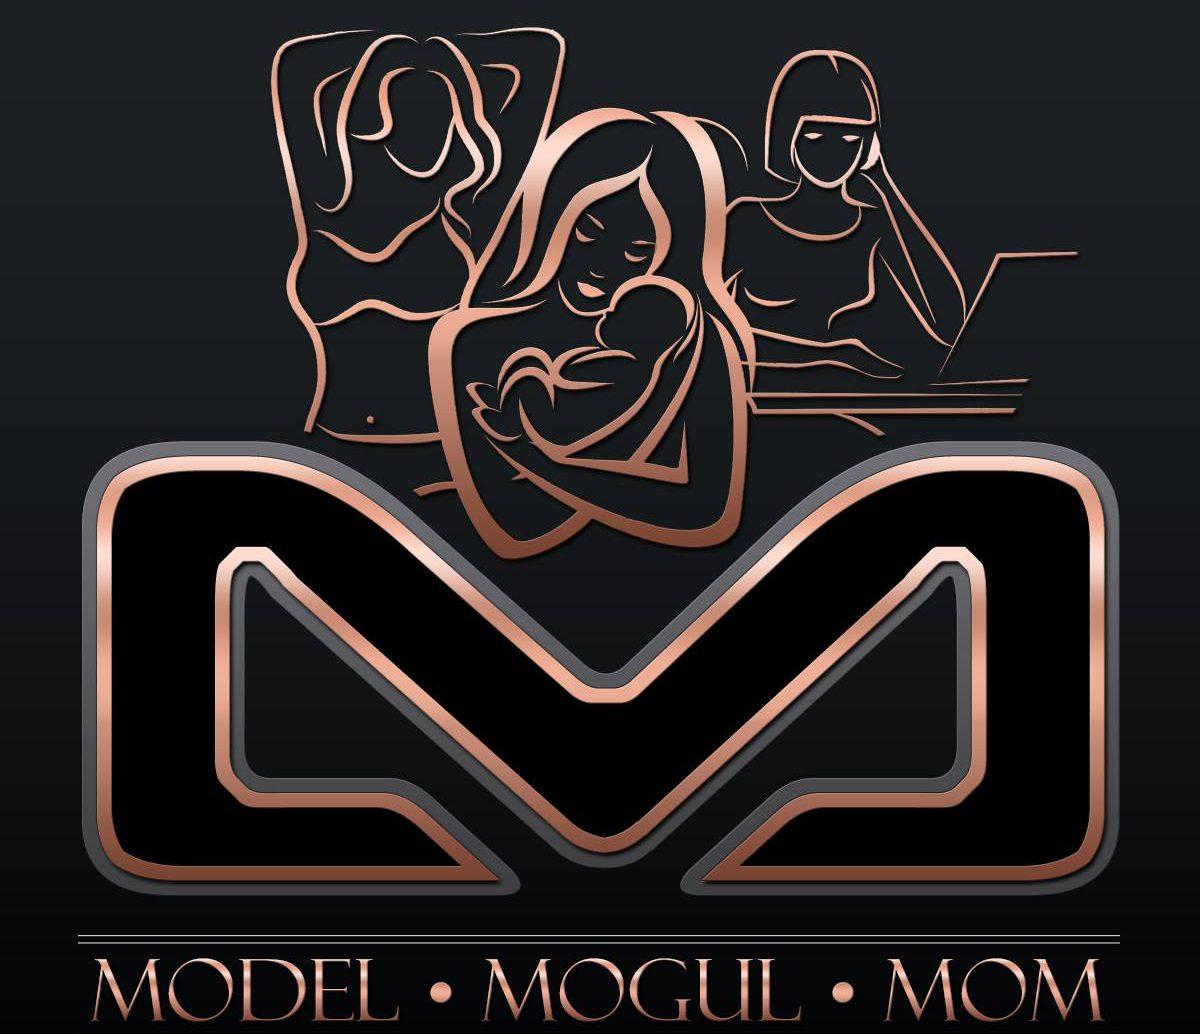 Model, Mogul, Mom